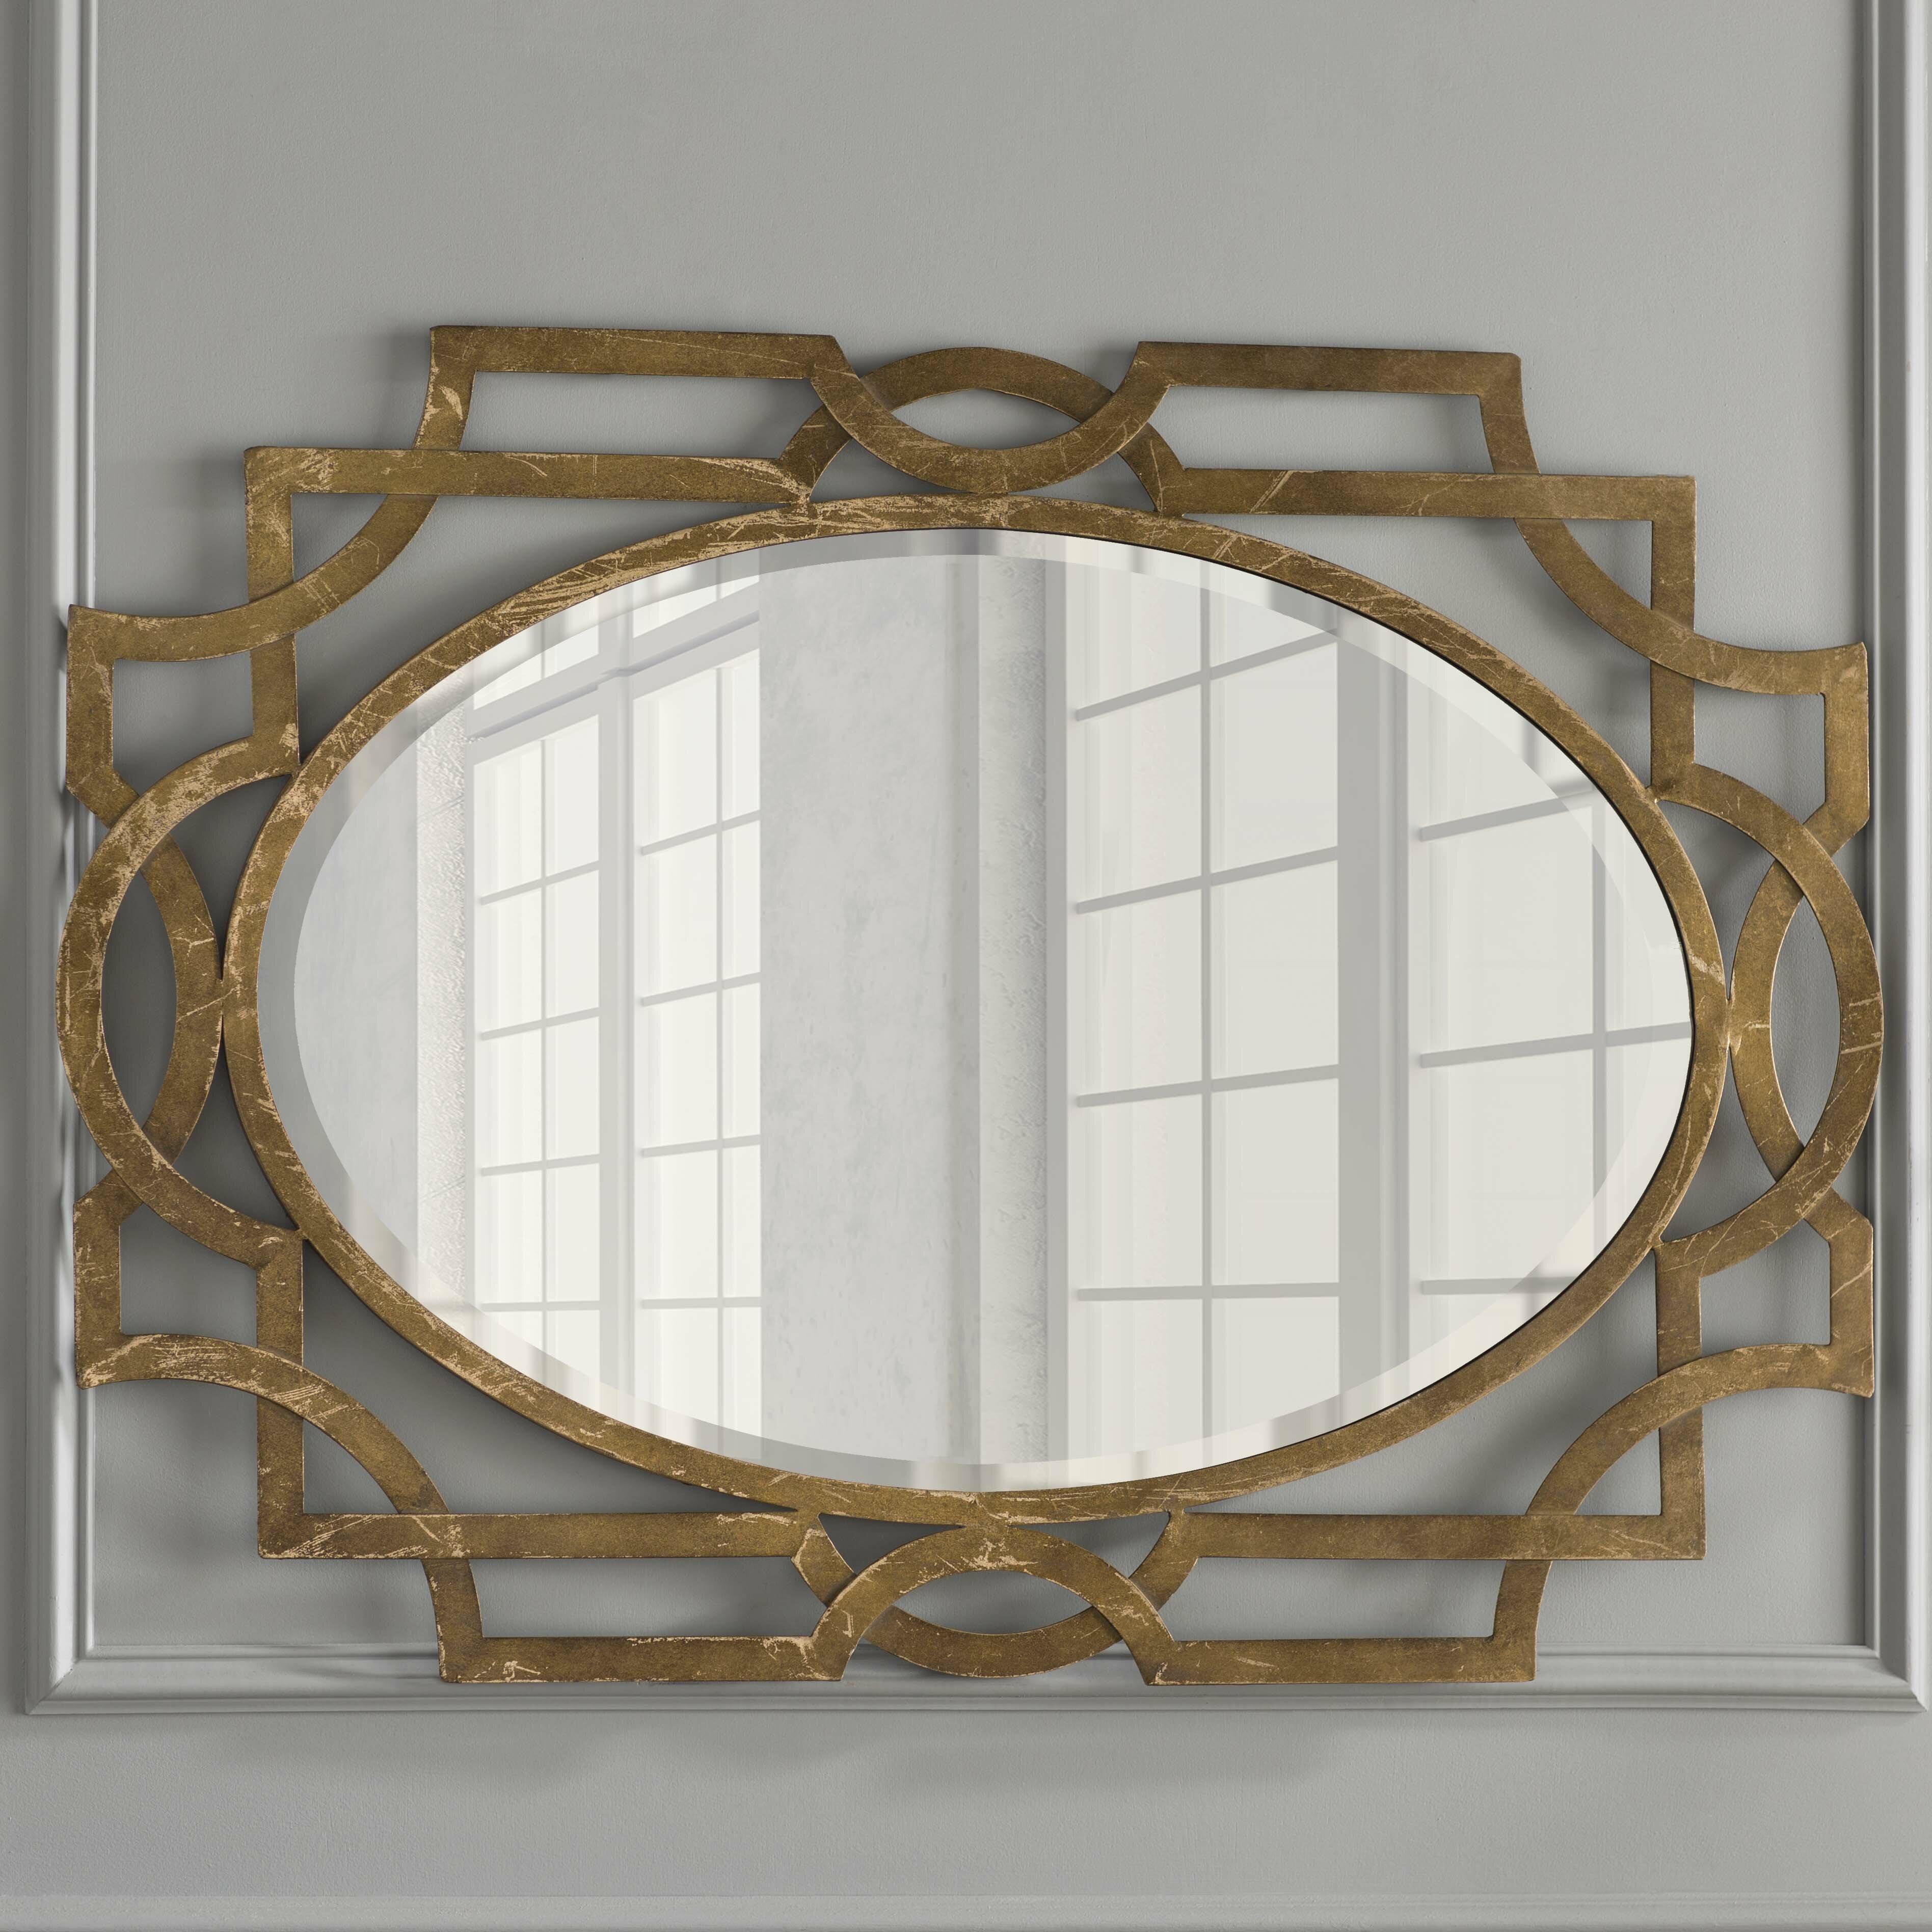 Willa Arlo Interiors Gold Oval Accent Mirror Reviews Wayfair Co Uk